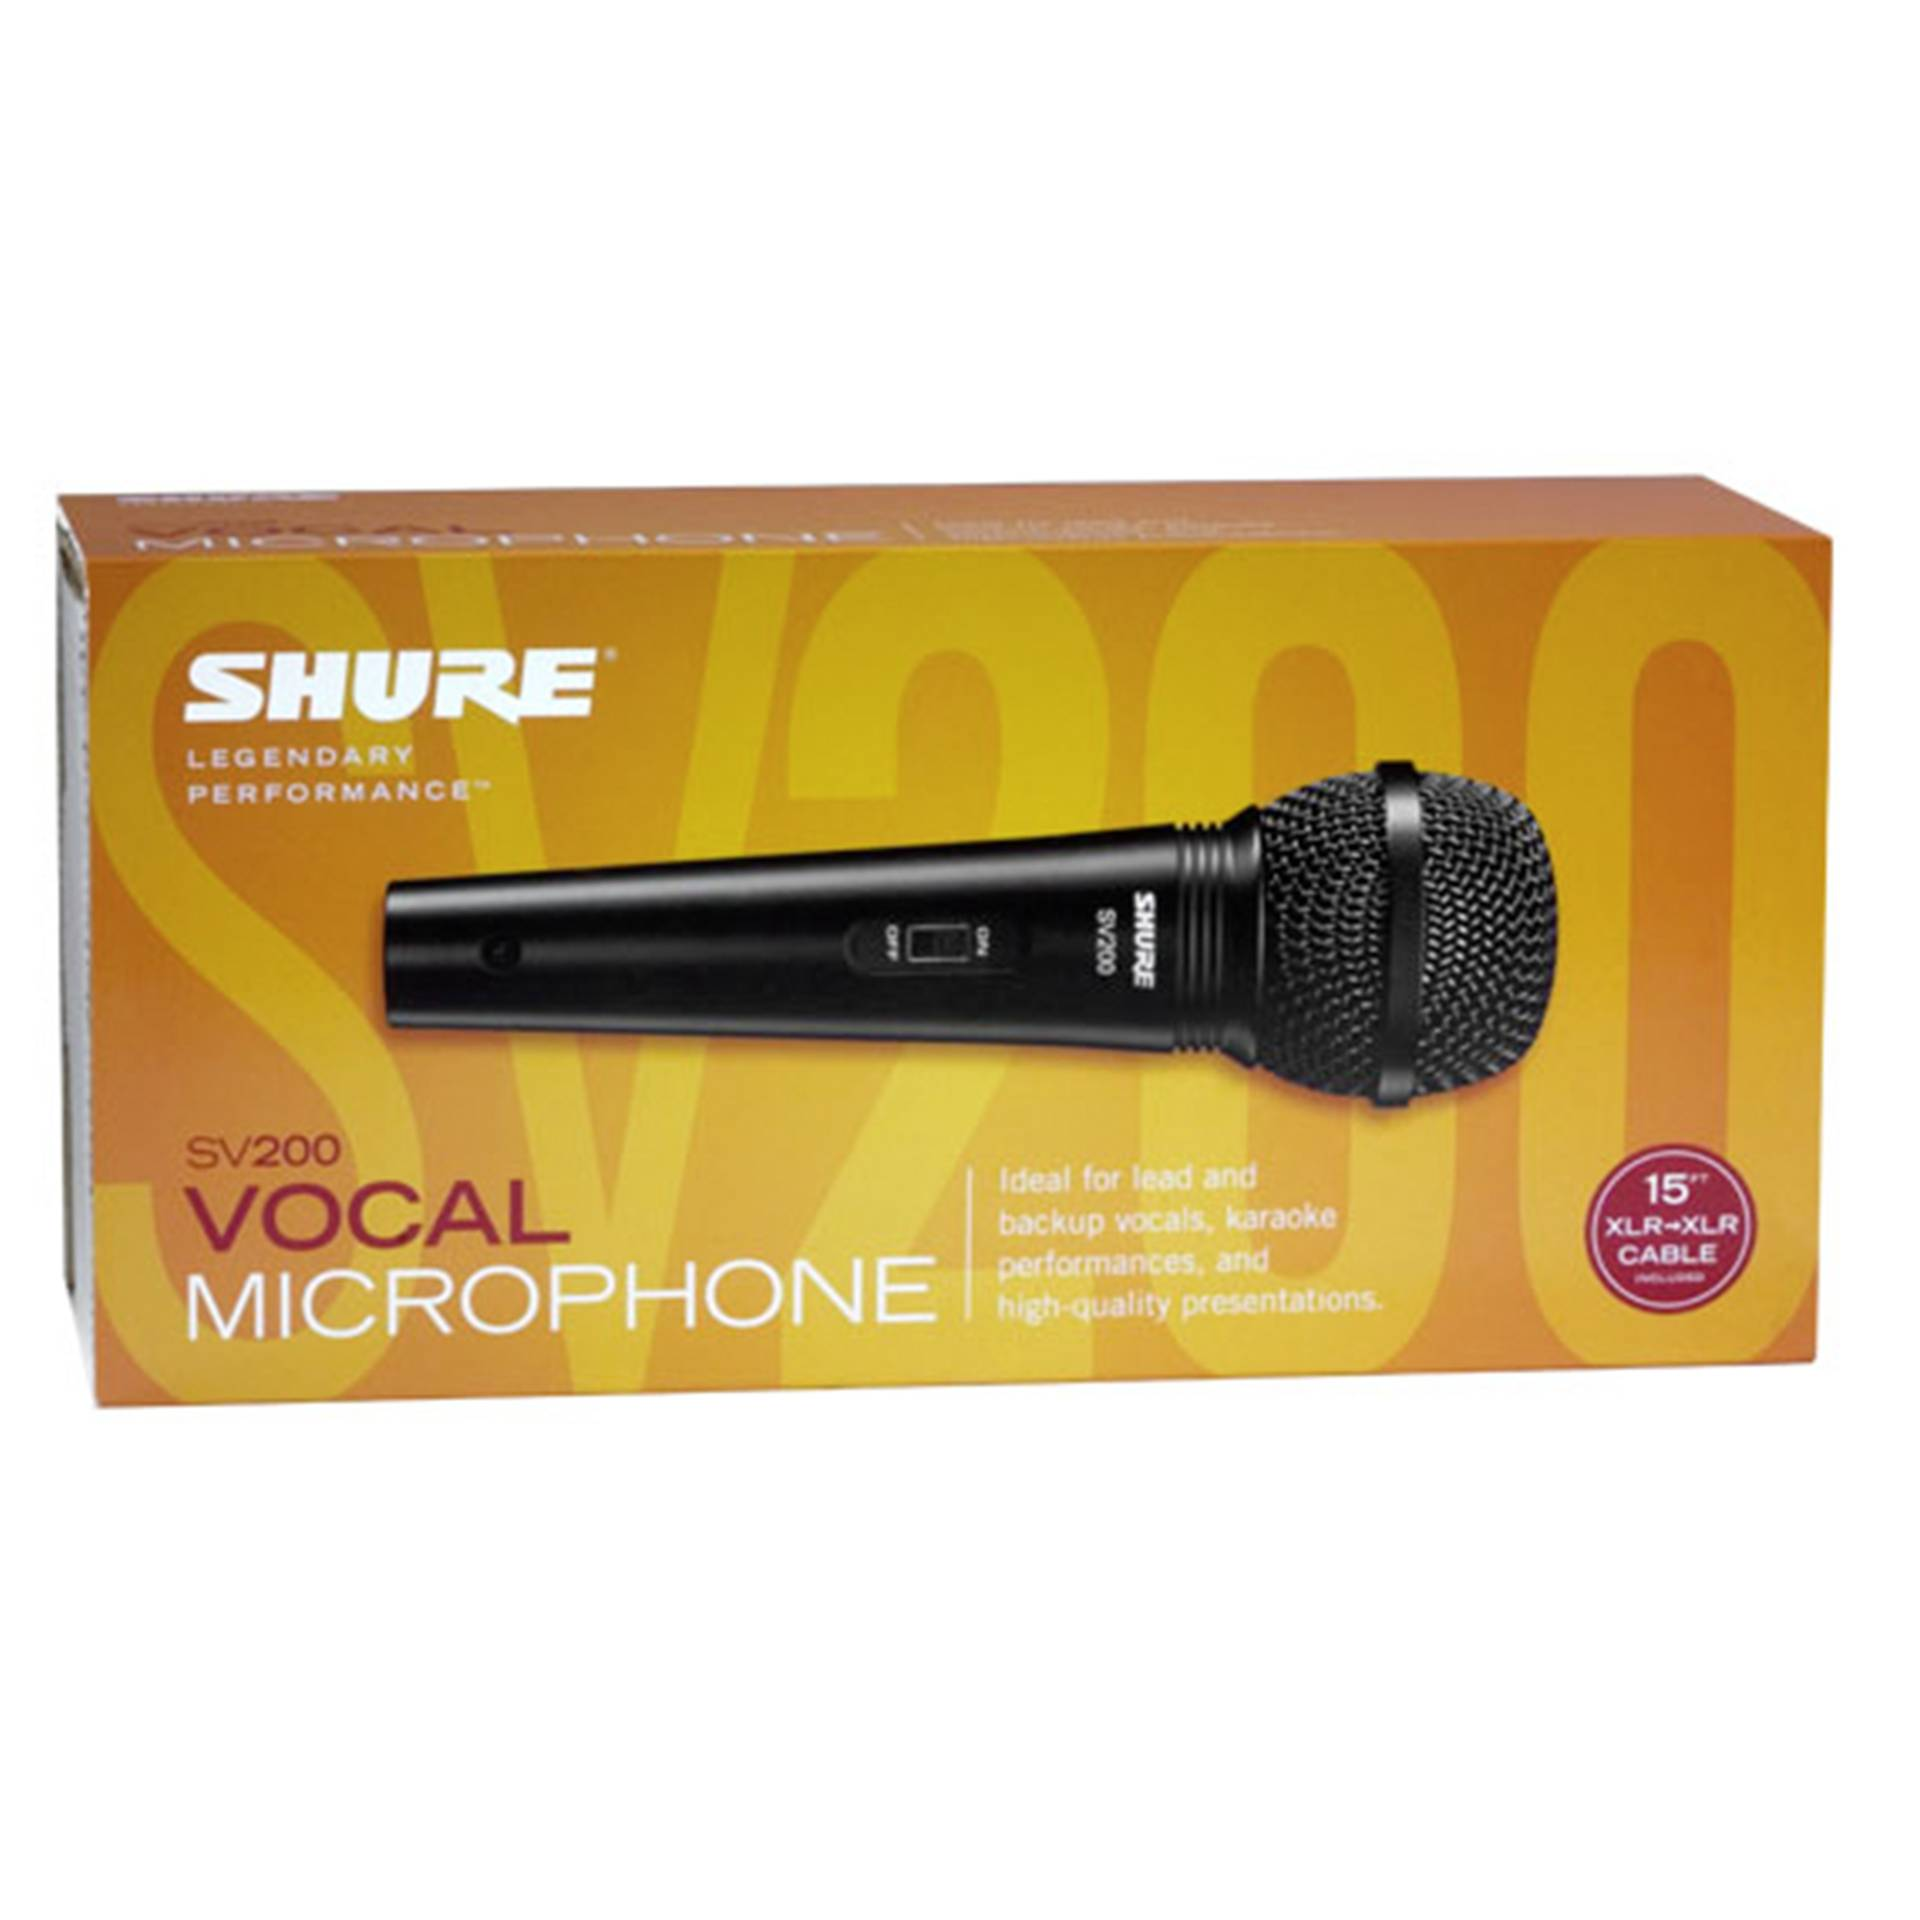 Shure SV200 microphone